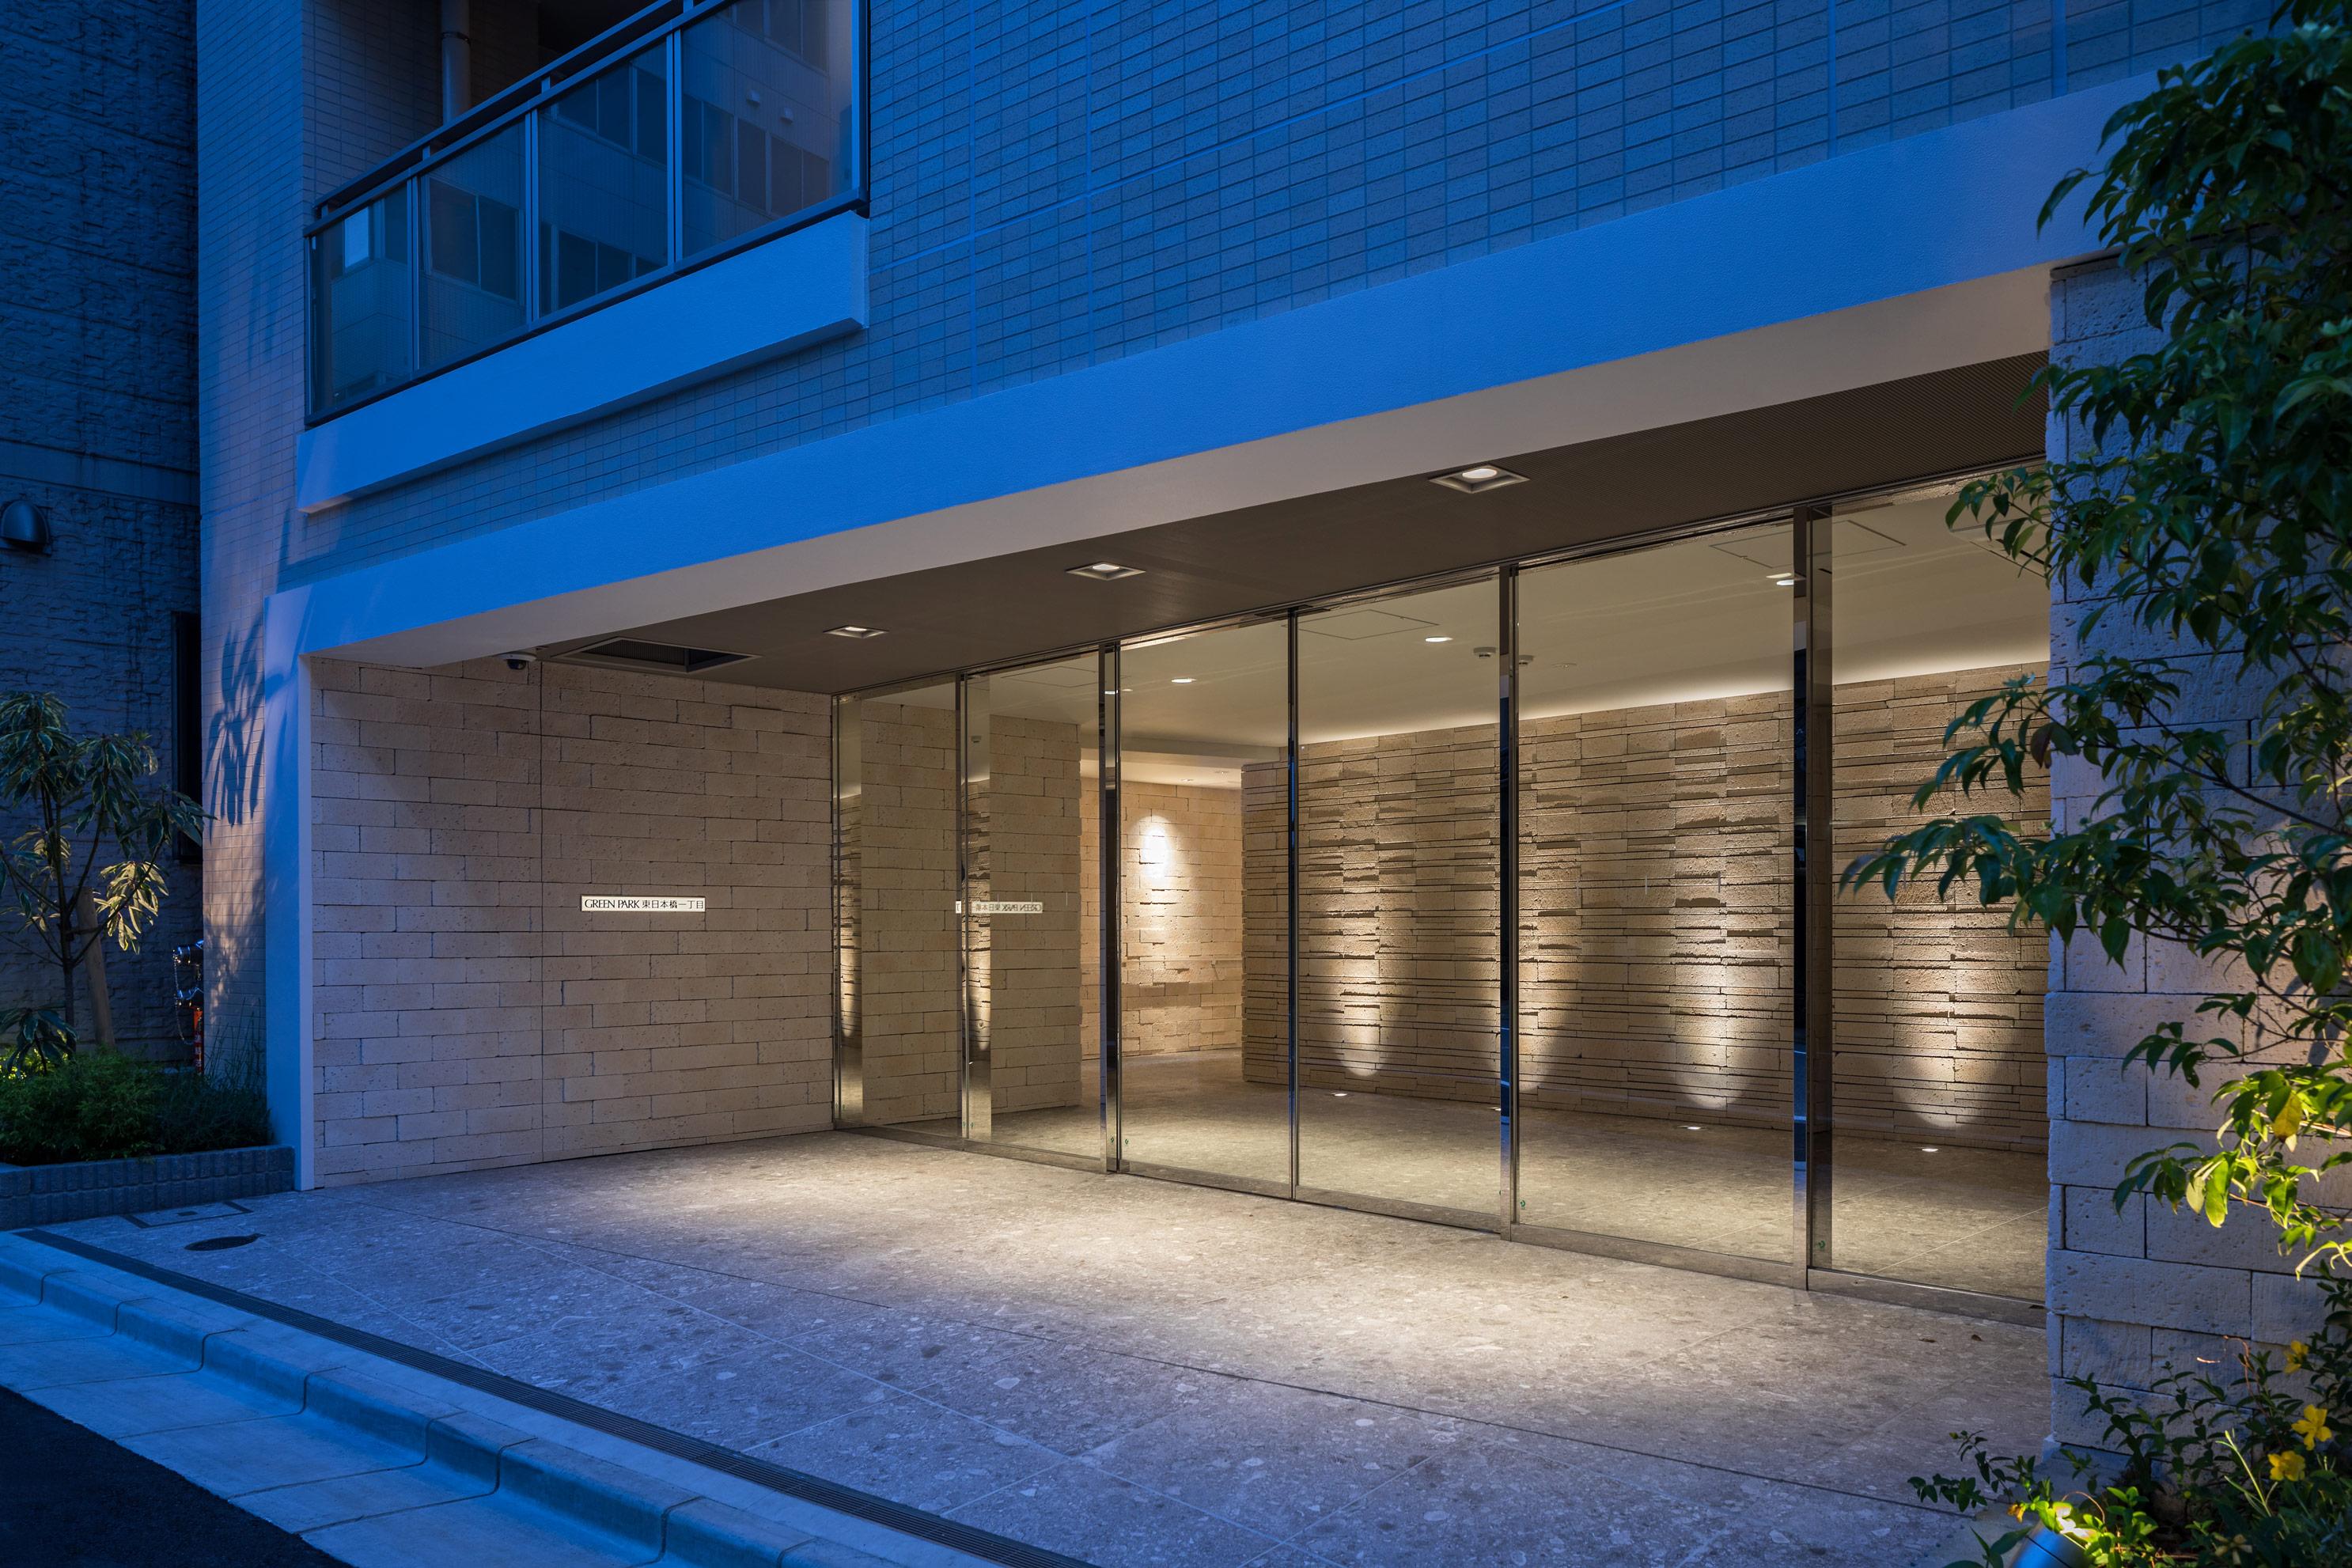 GREEN PARK 東日本橋一丁目   マンションギャラリー